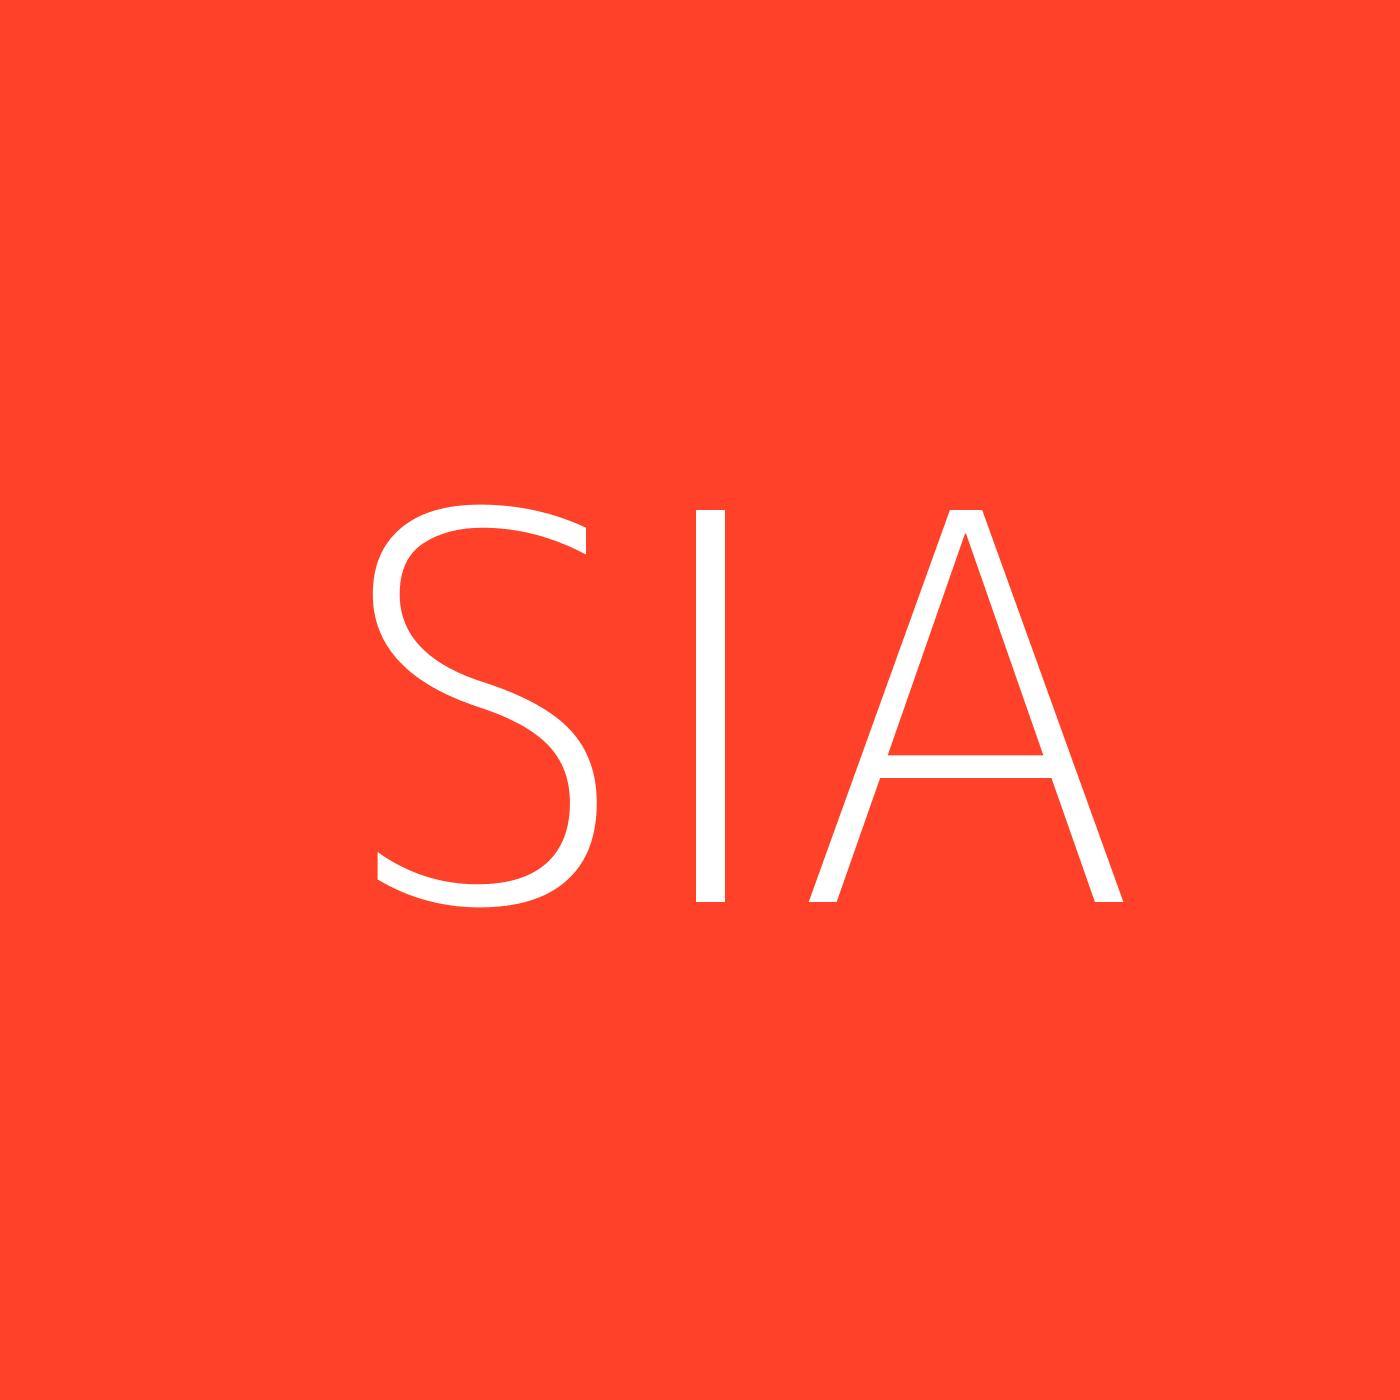 Sia Playlist Artwork